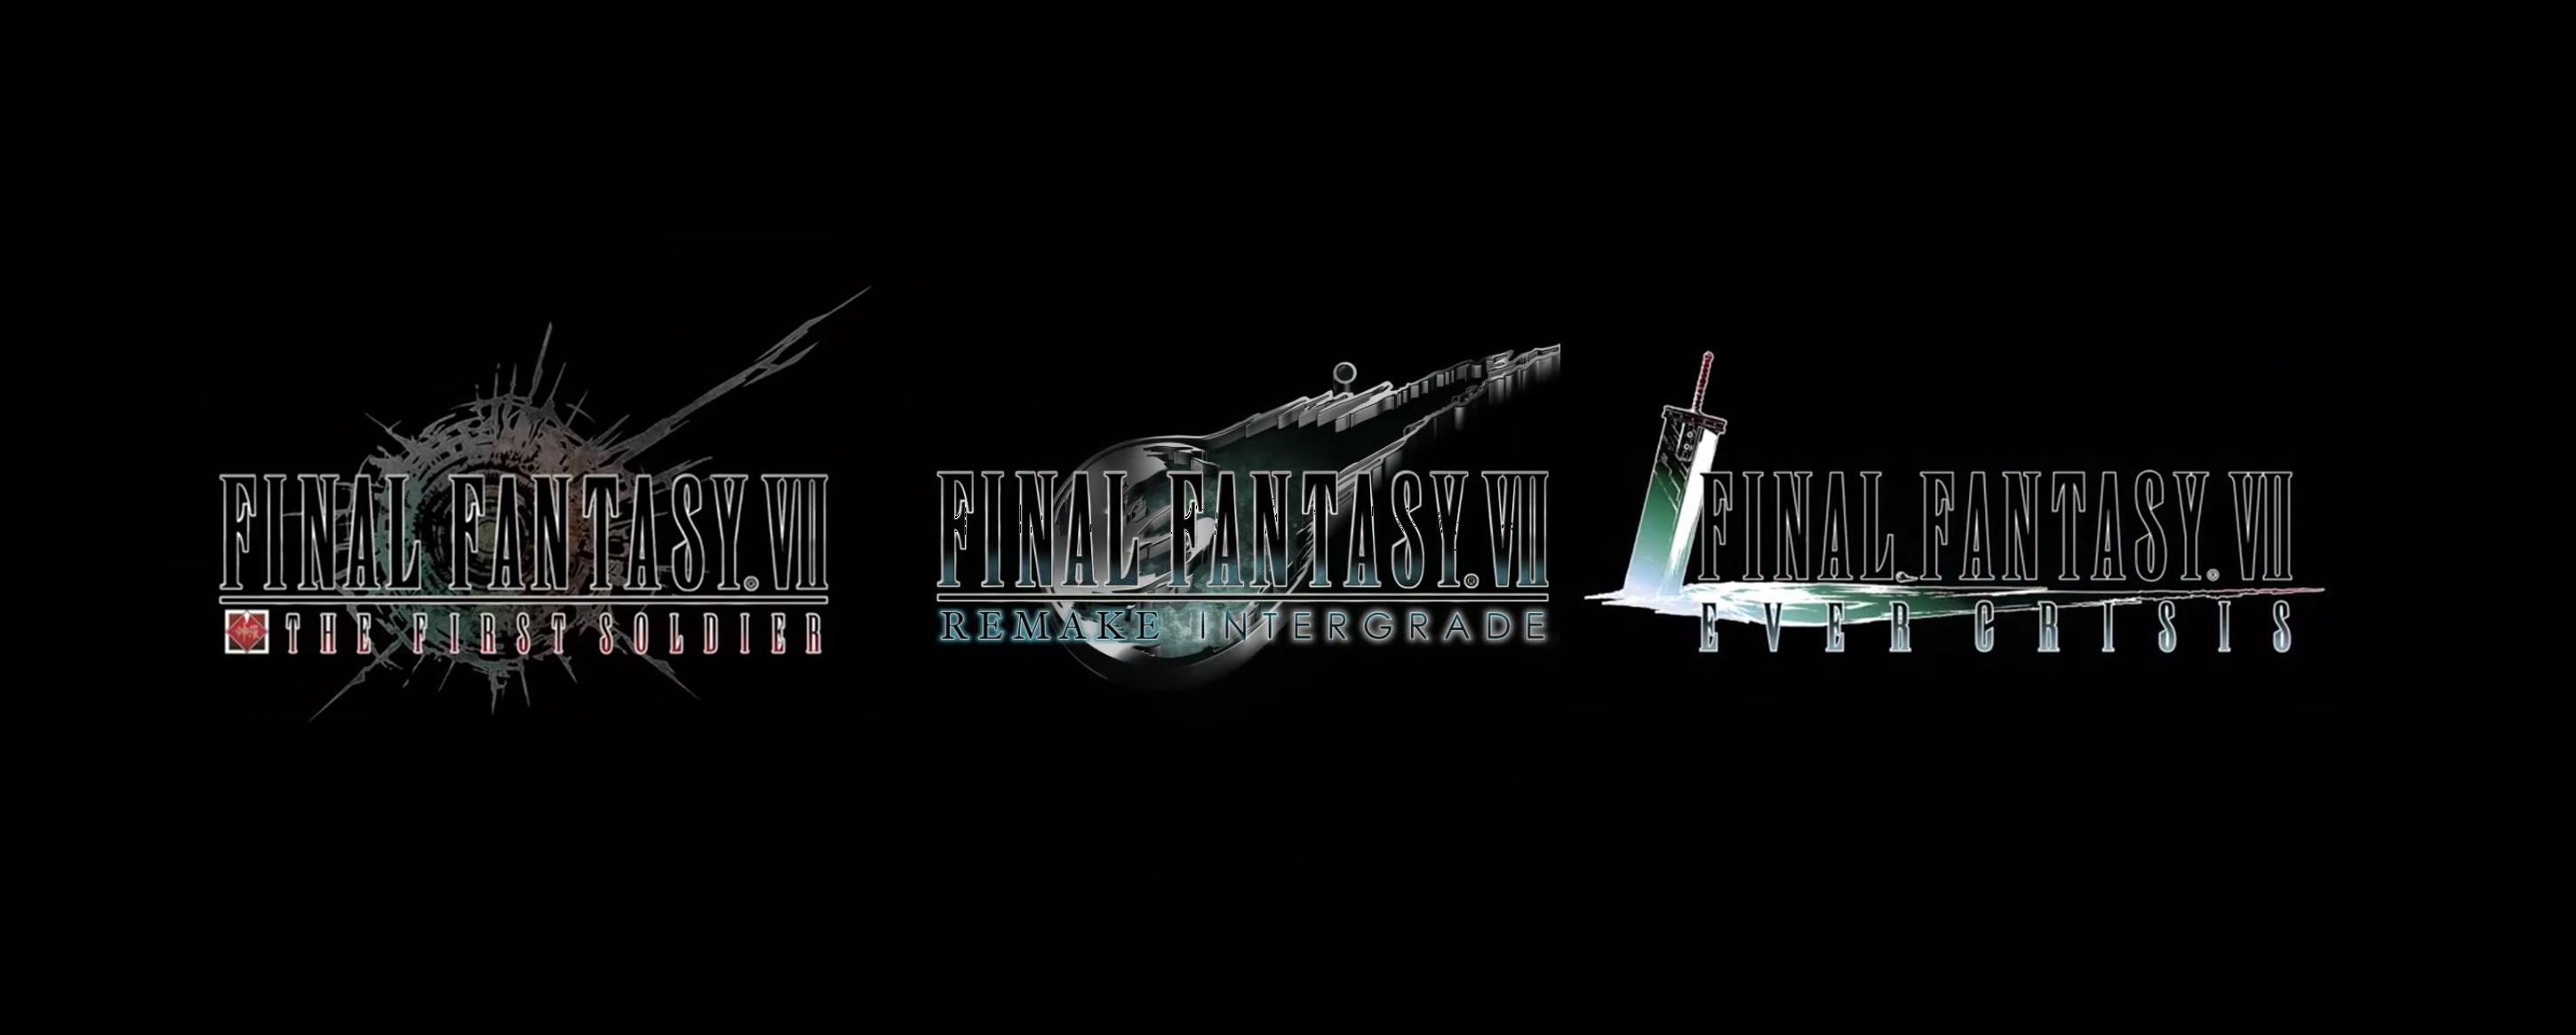 Final Fantasy 7 Remake Intergrade Interview with Nomura Translation